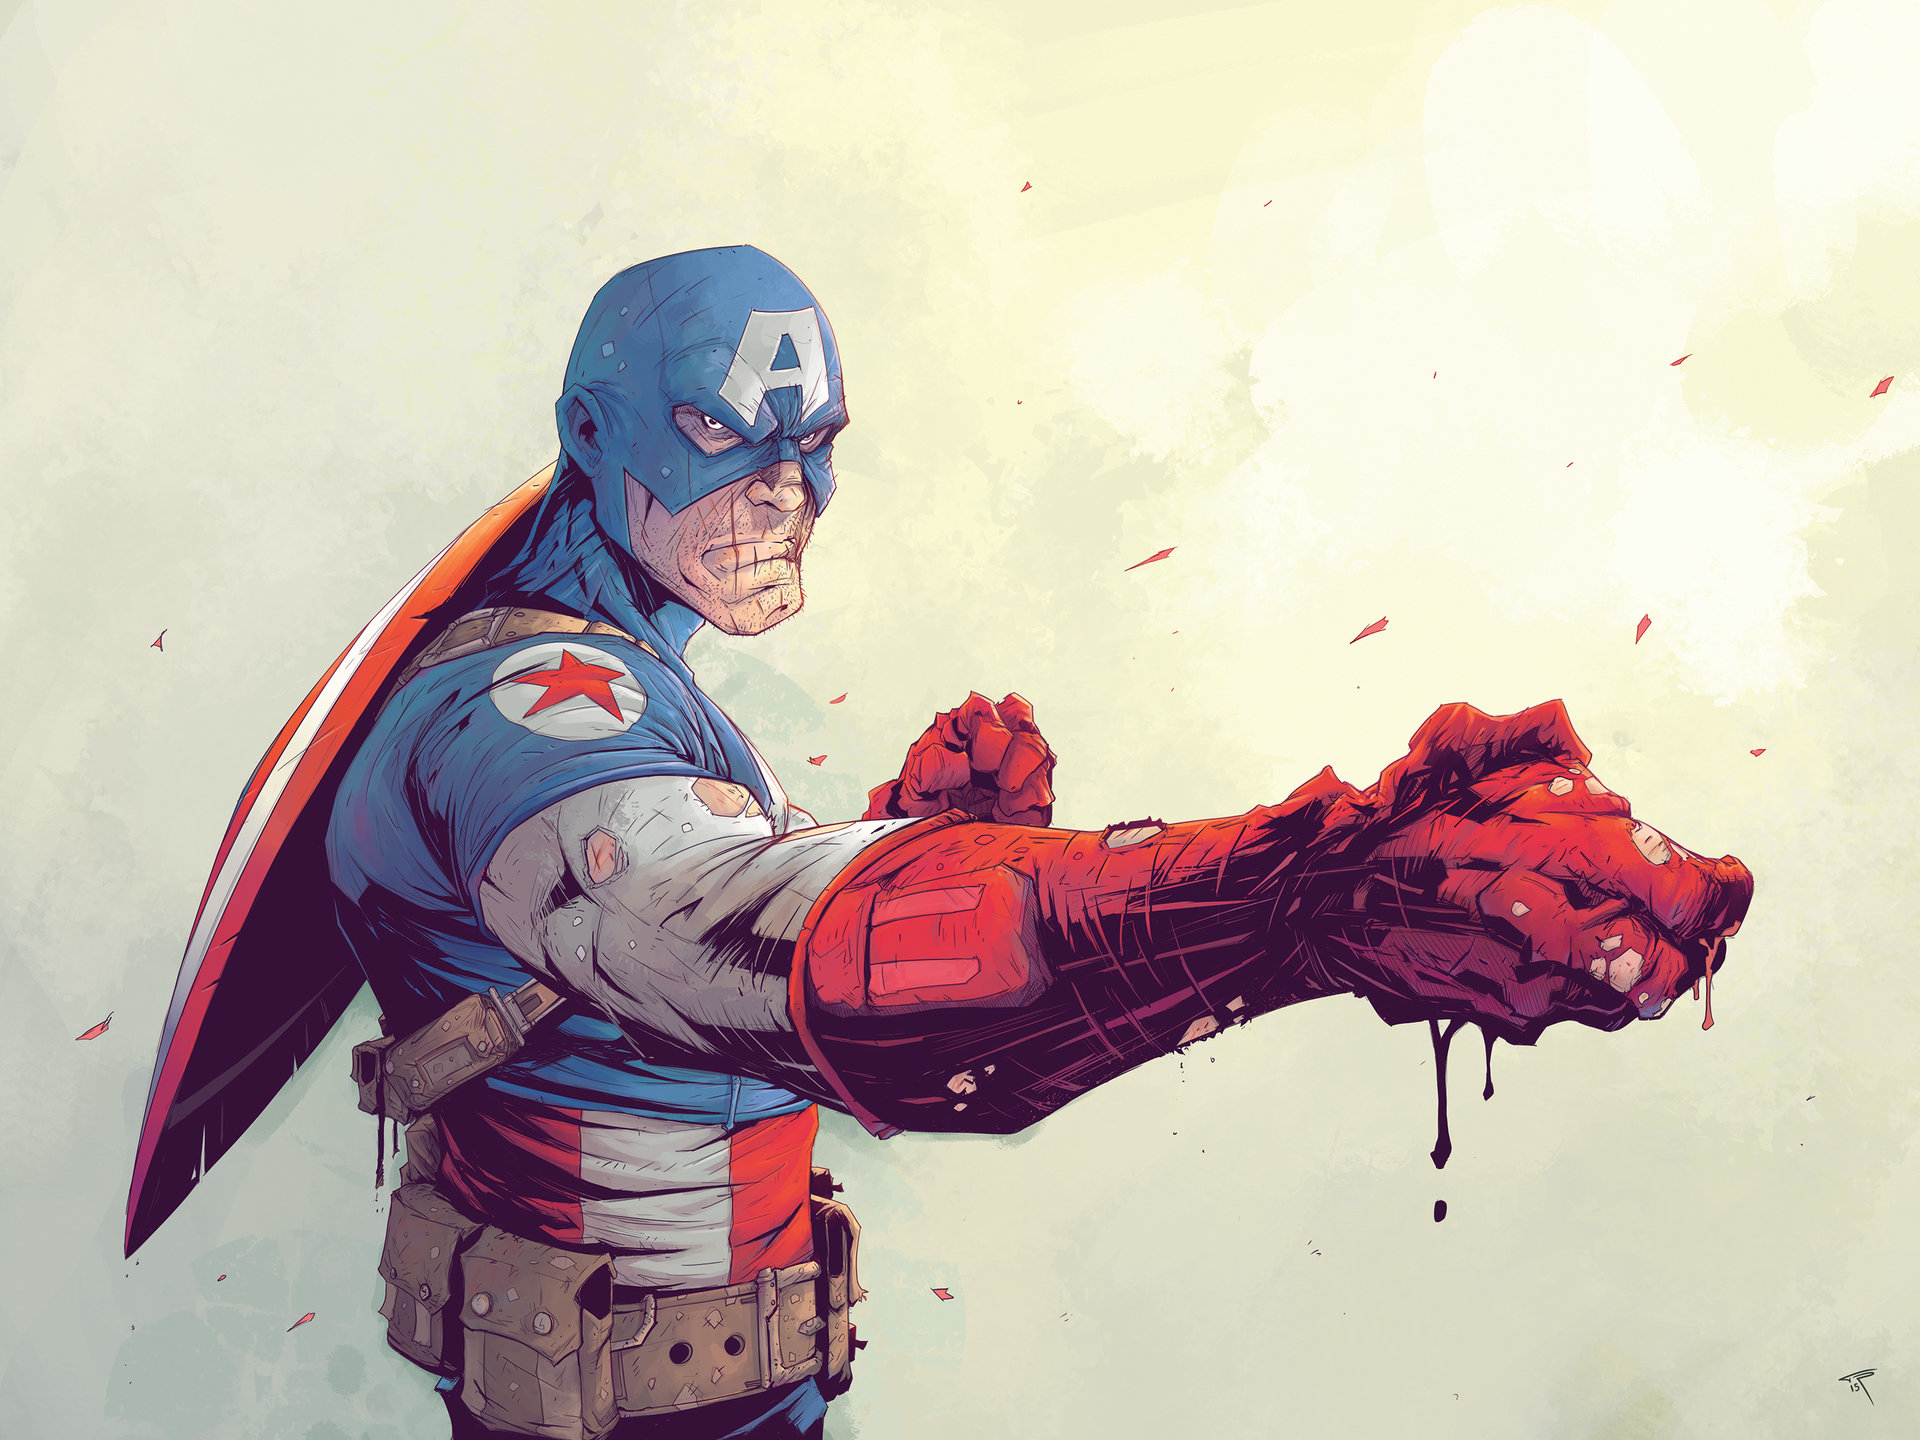 Tonton revolver captain america ld